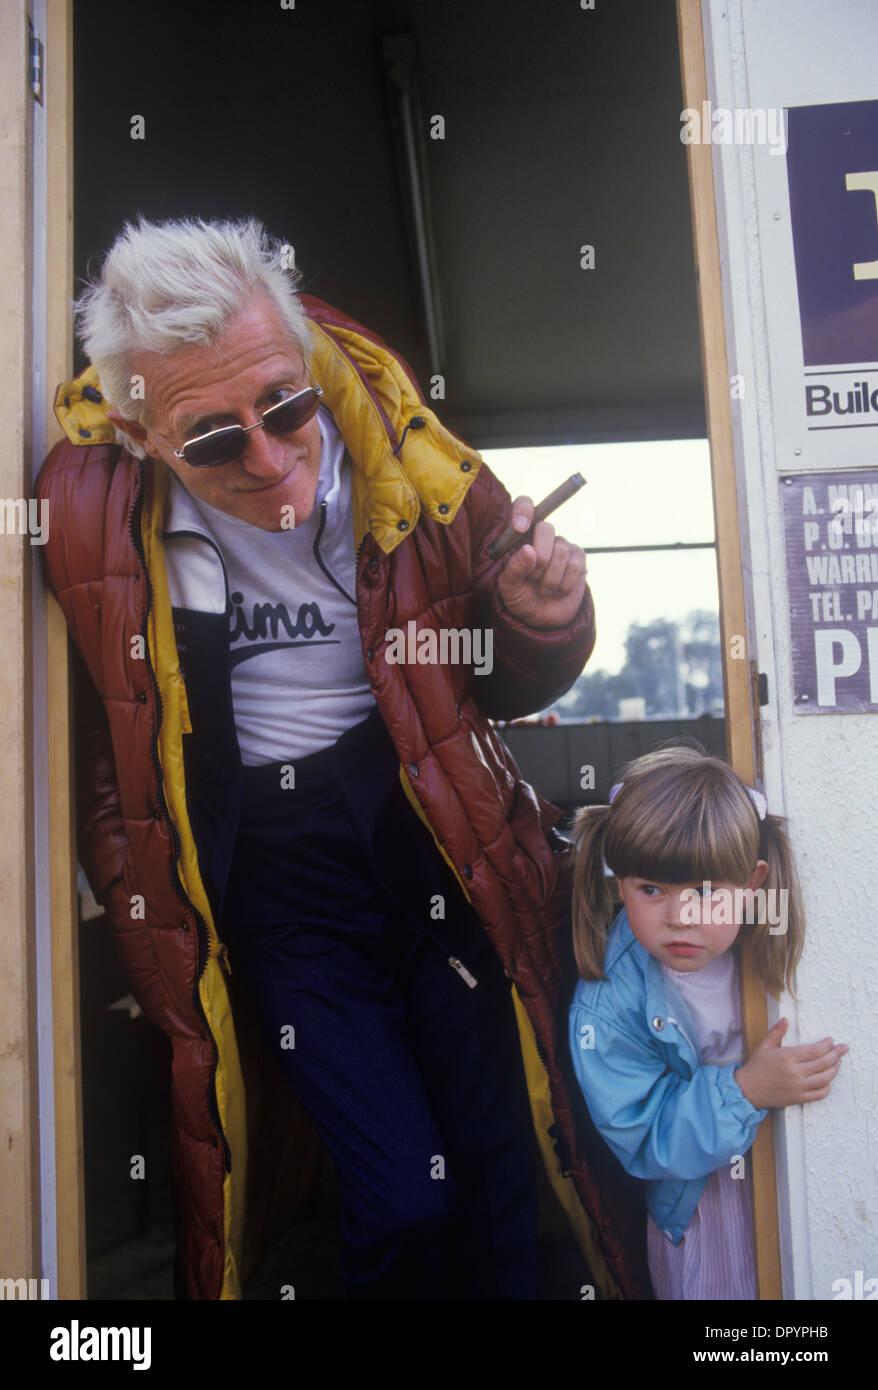 Wonderful Jimmy Savile And Pre Teen Girl 1980s UK HOMER SYKES   Stock Image